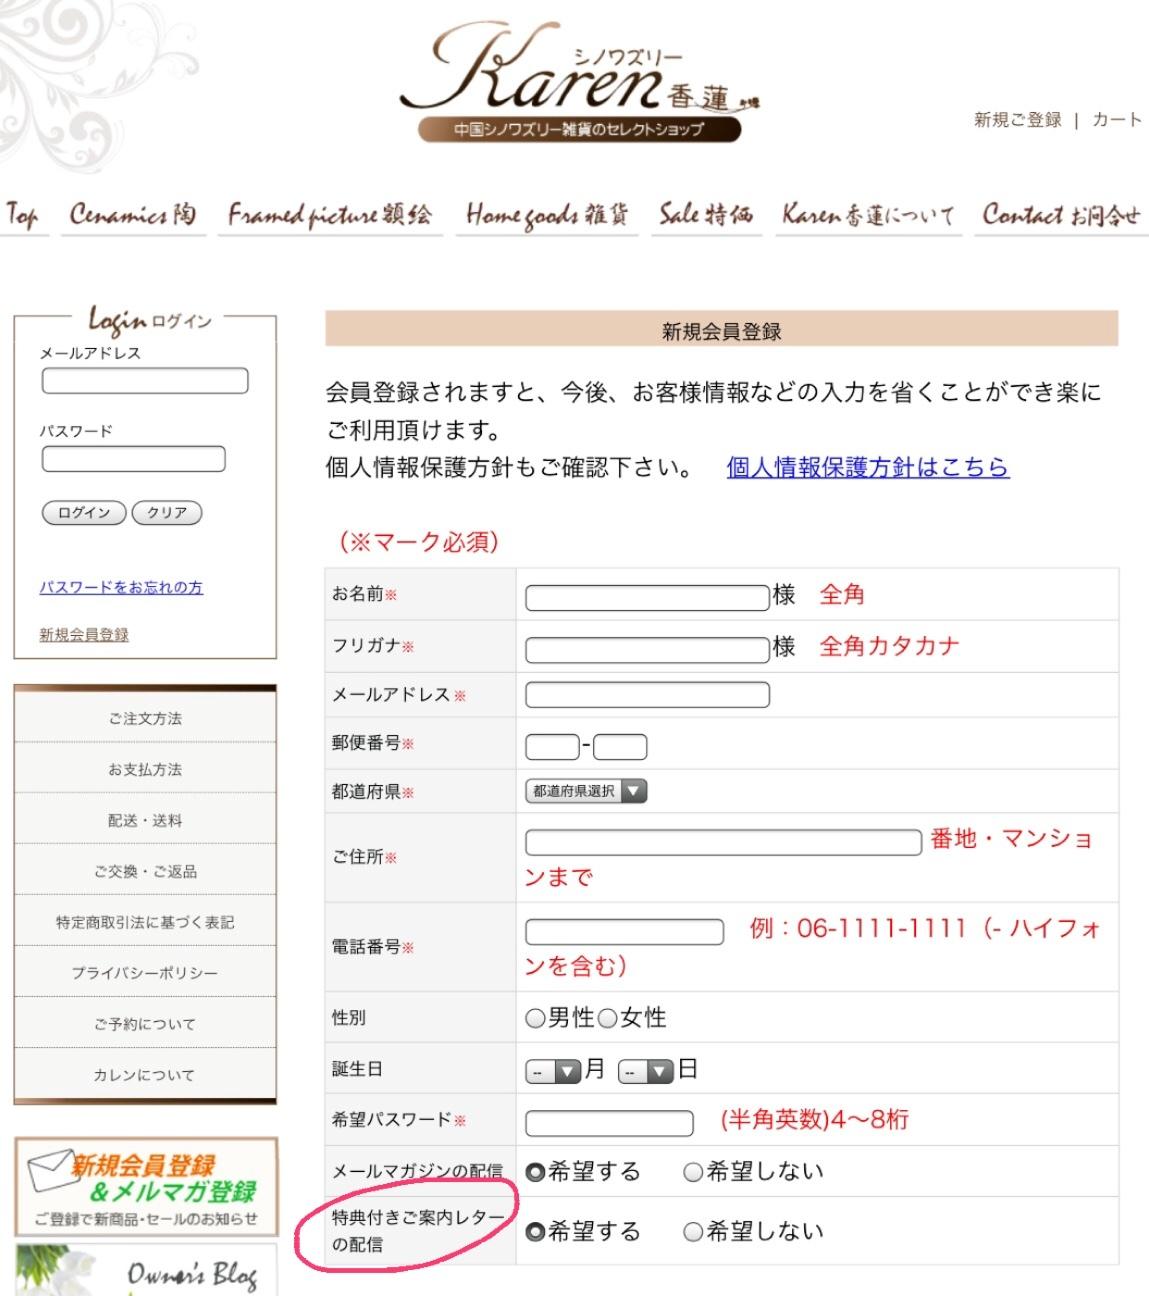 「Karenのシノワ旅」発行のお知らせ_c0192724_10112903.jpg